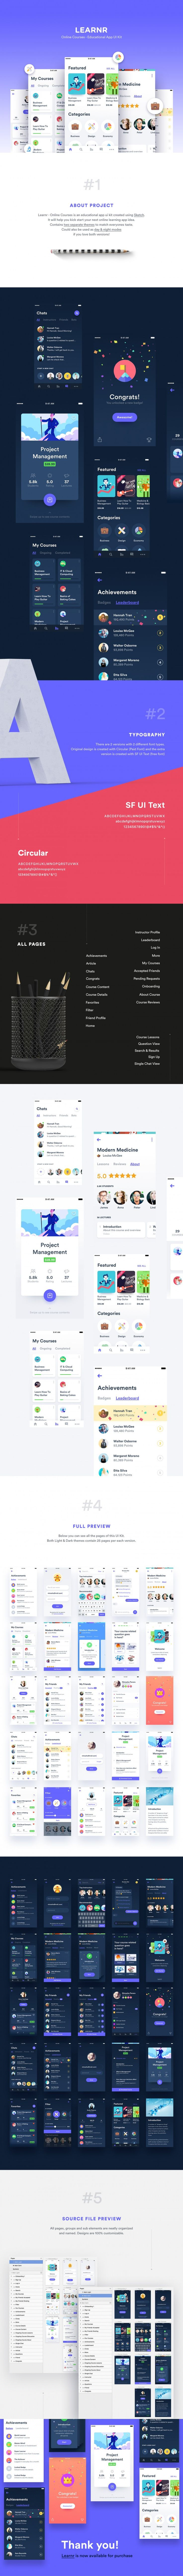 Learnr – Online Courses Educational App UI Kit